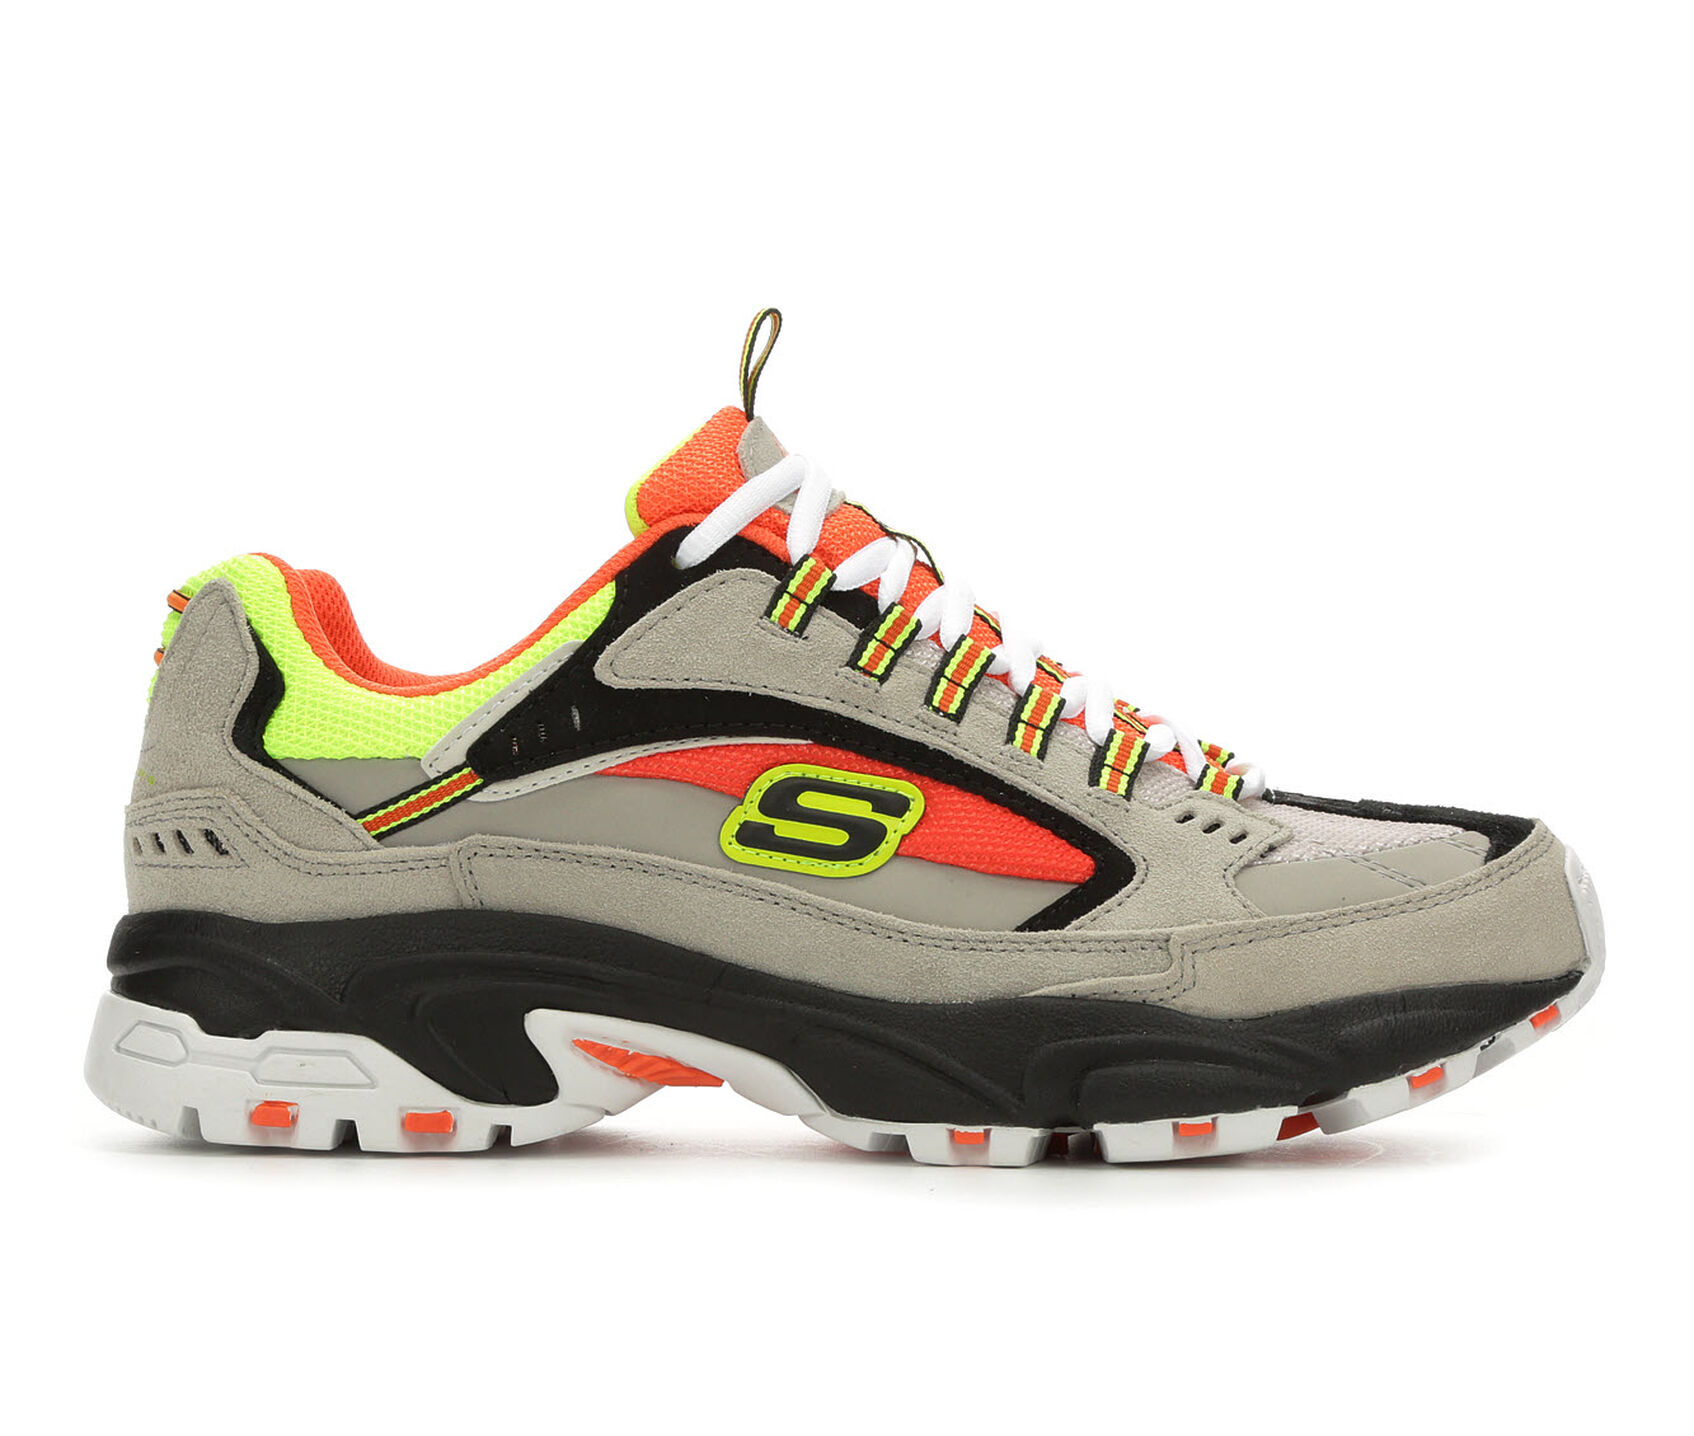 48918cc3923f Men s Skechers Cutback 51286 Training Shoes